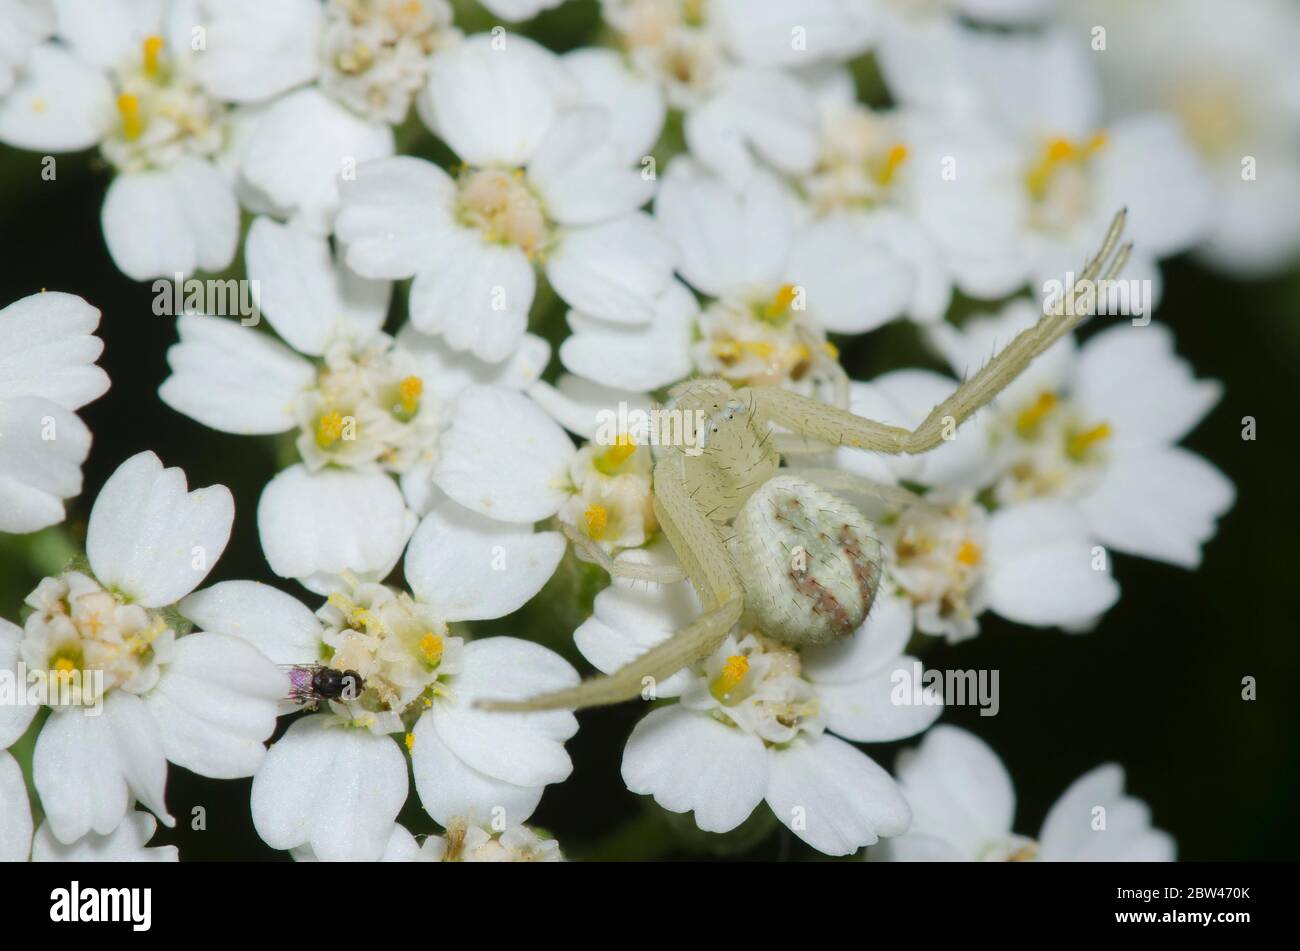 Crab Spider, Mecaphesa sp., lurking on yarrow, Achillea millefolium Stock Photo